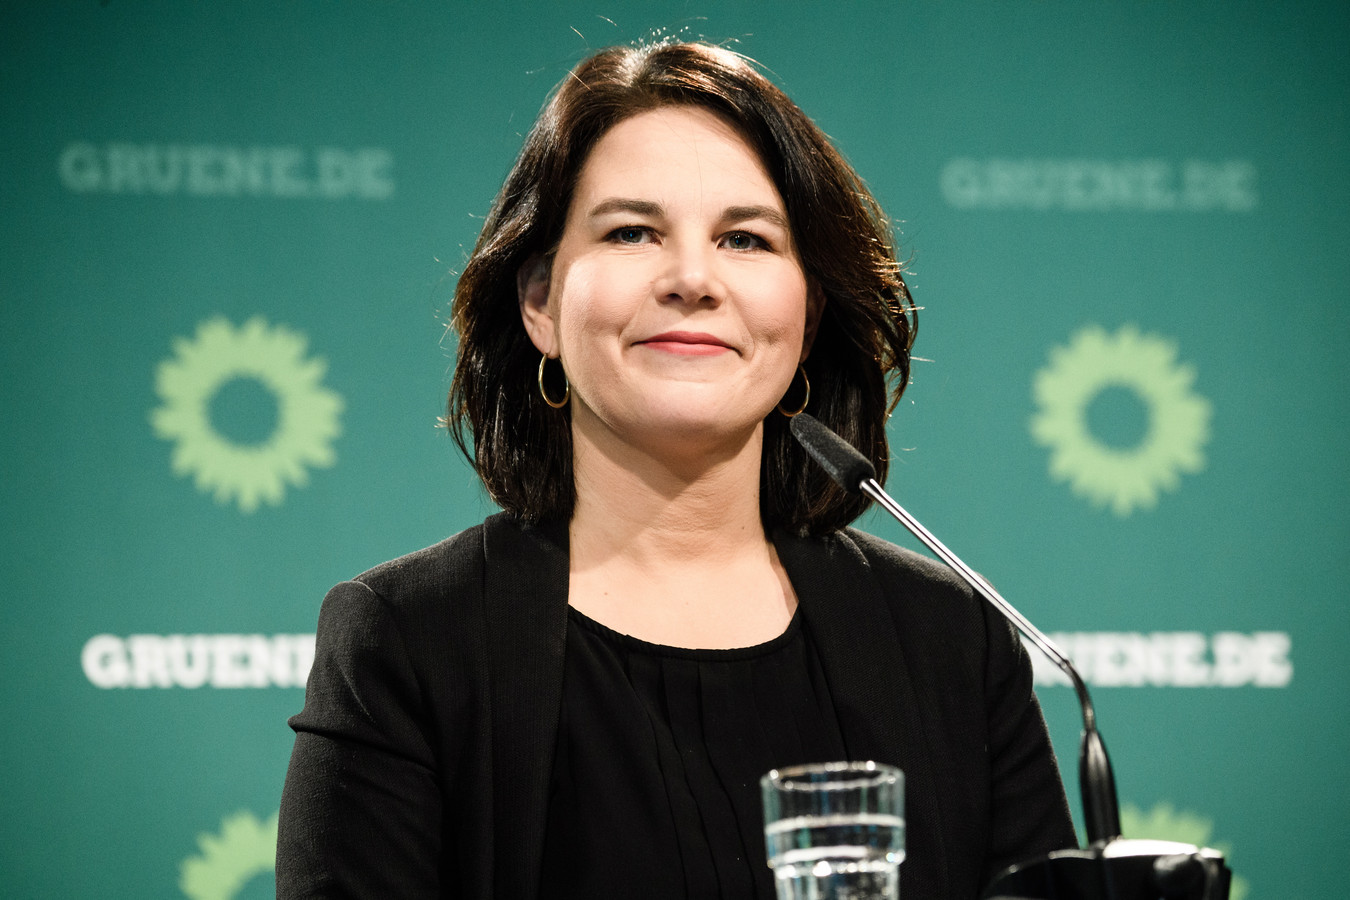 Covoorzitter Annalena Baerbock van Bundnis 90/Die Grünen.